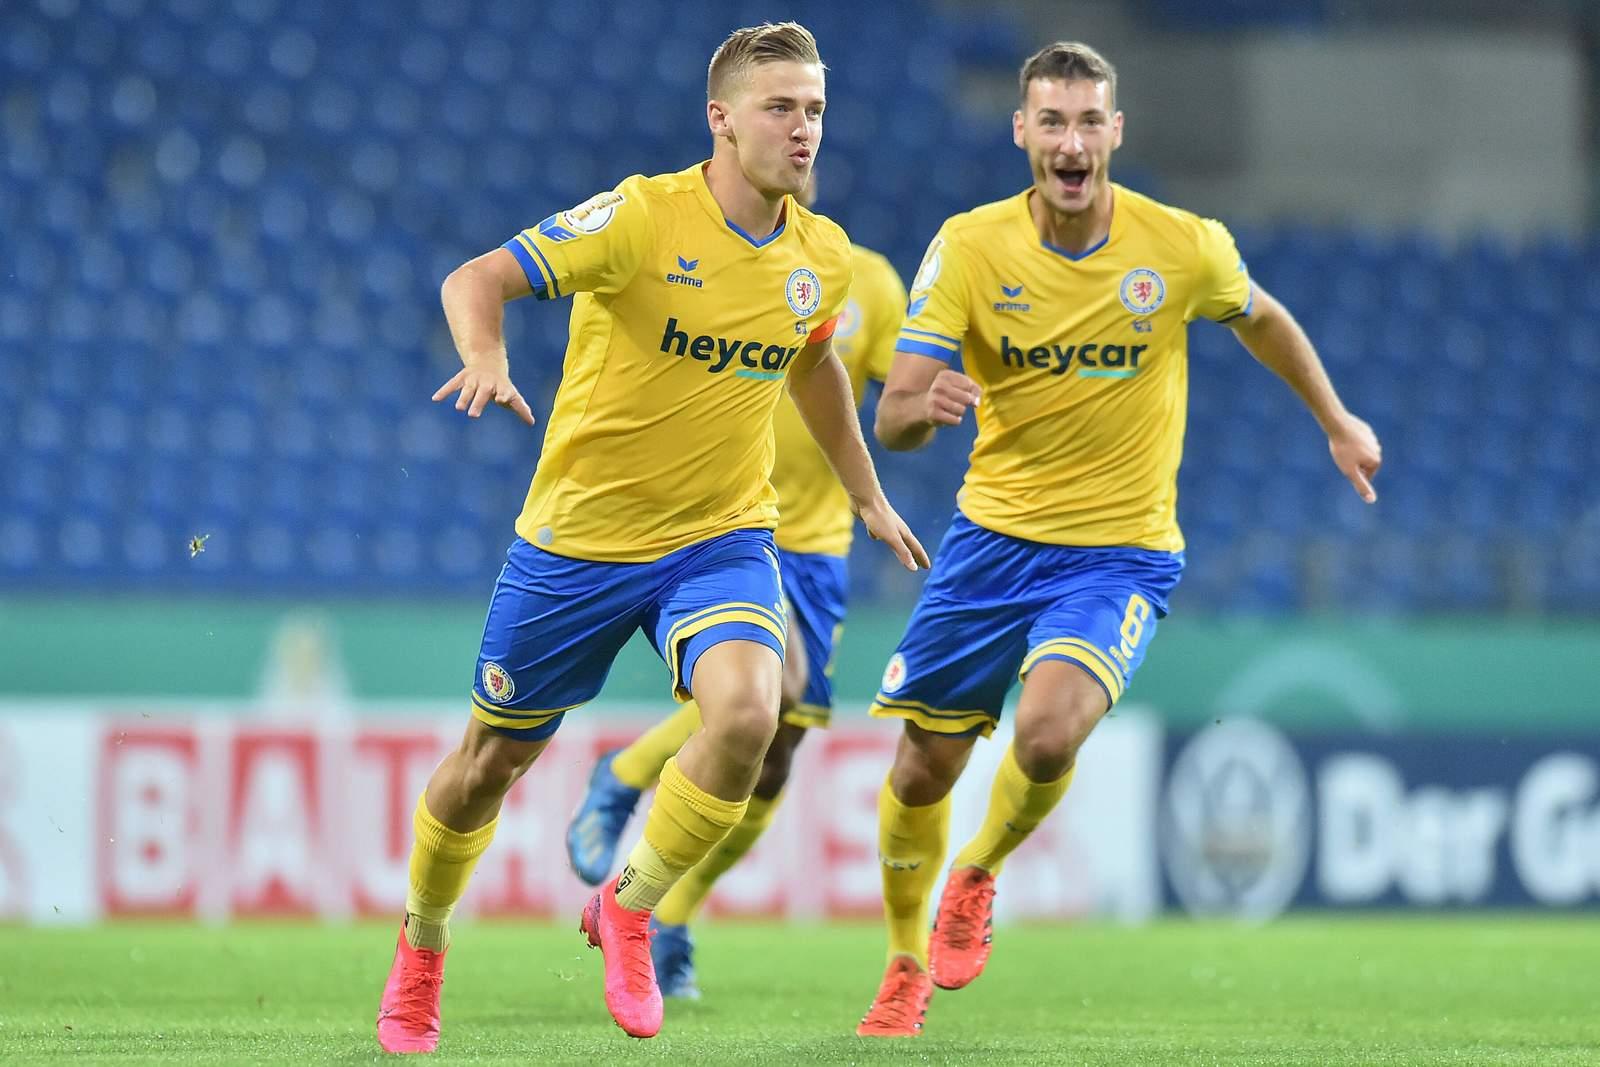 Martin Kobylański jubelt nach Tor im DFB-Pokal gegen Hertha